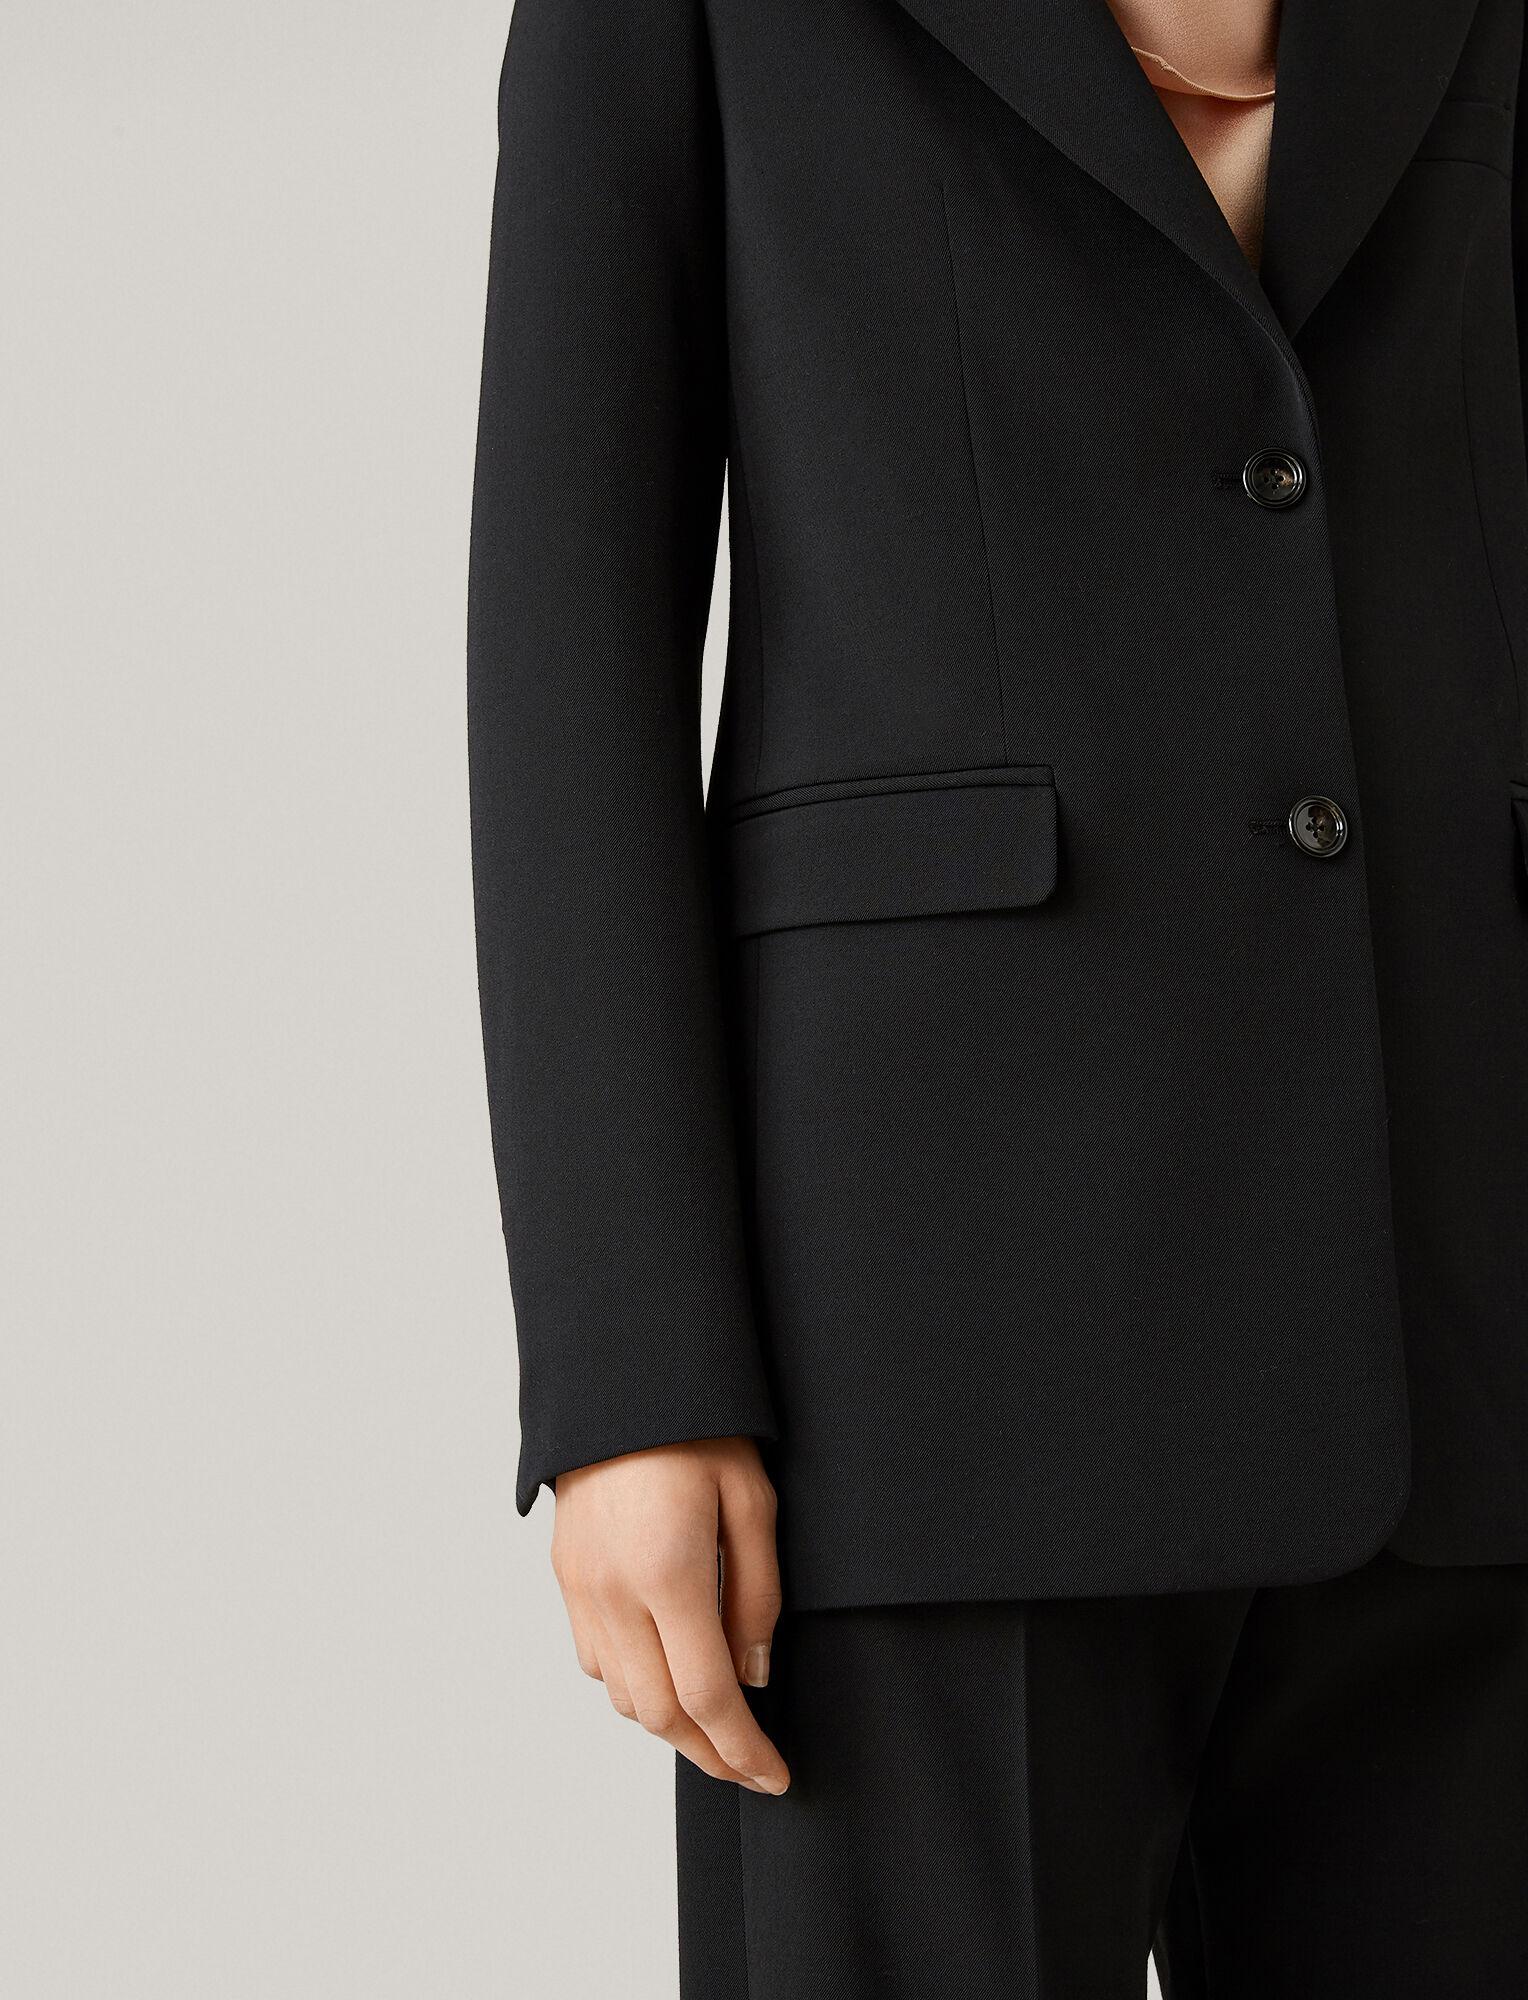 Joseph, New Lorenzo Comfort Wool Jacket, in BLACK